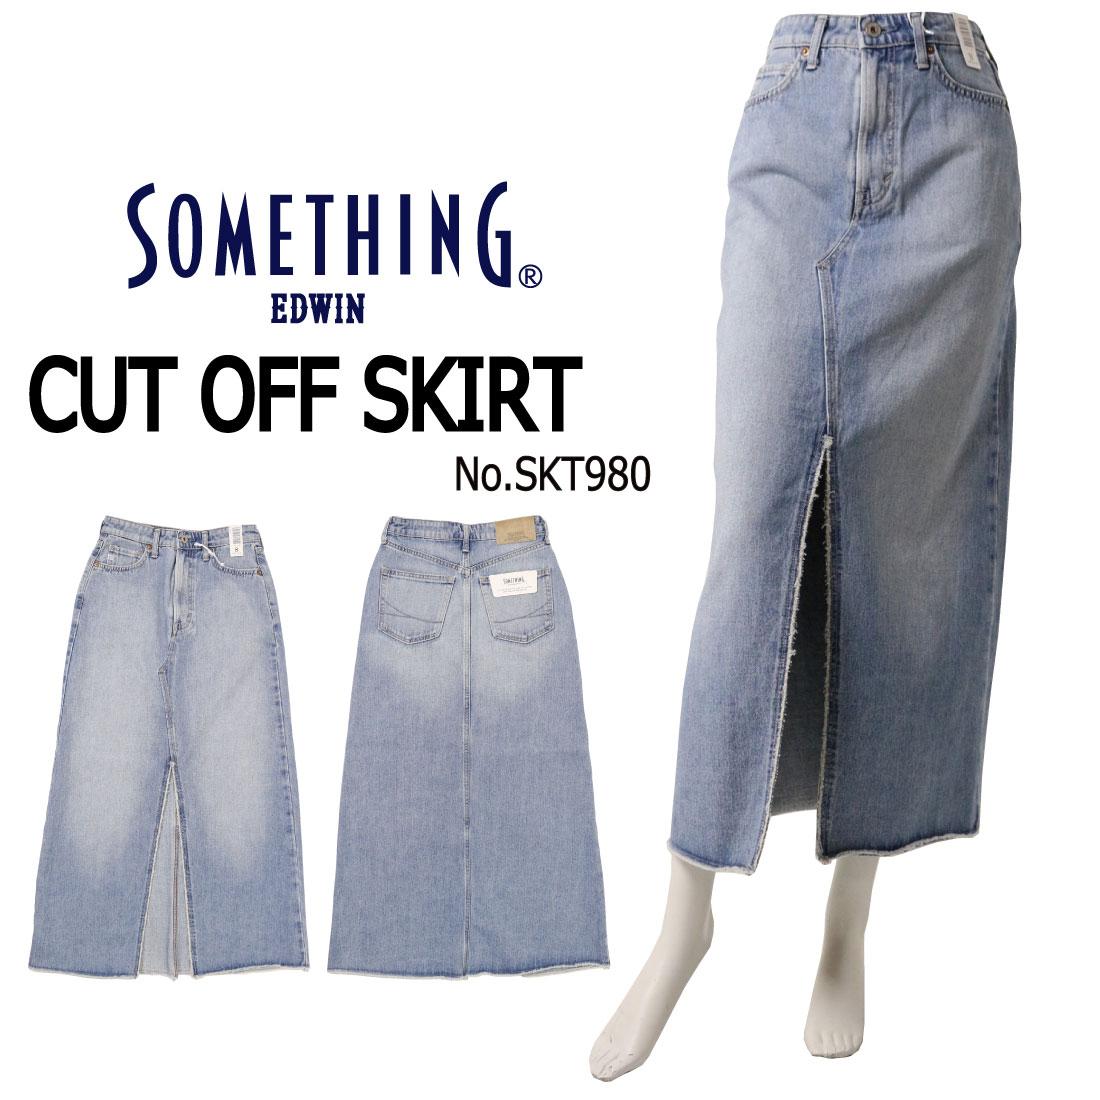 SOMETHING サムシング スカート スリット カットオフ SKT980 淡色 94 レディース ボトムス 送料無料